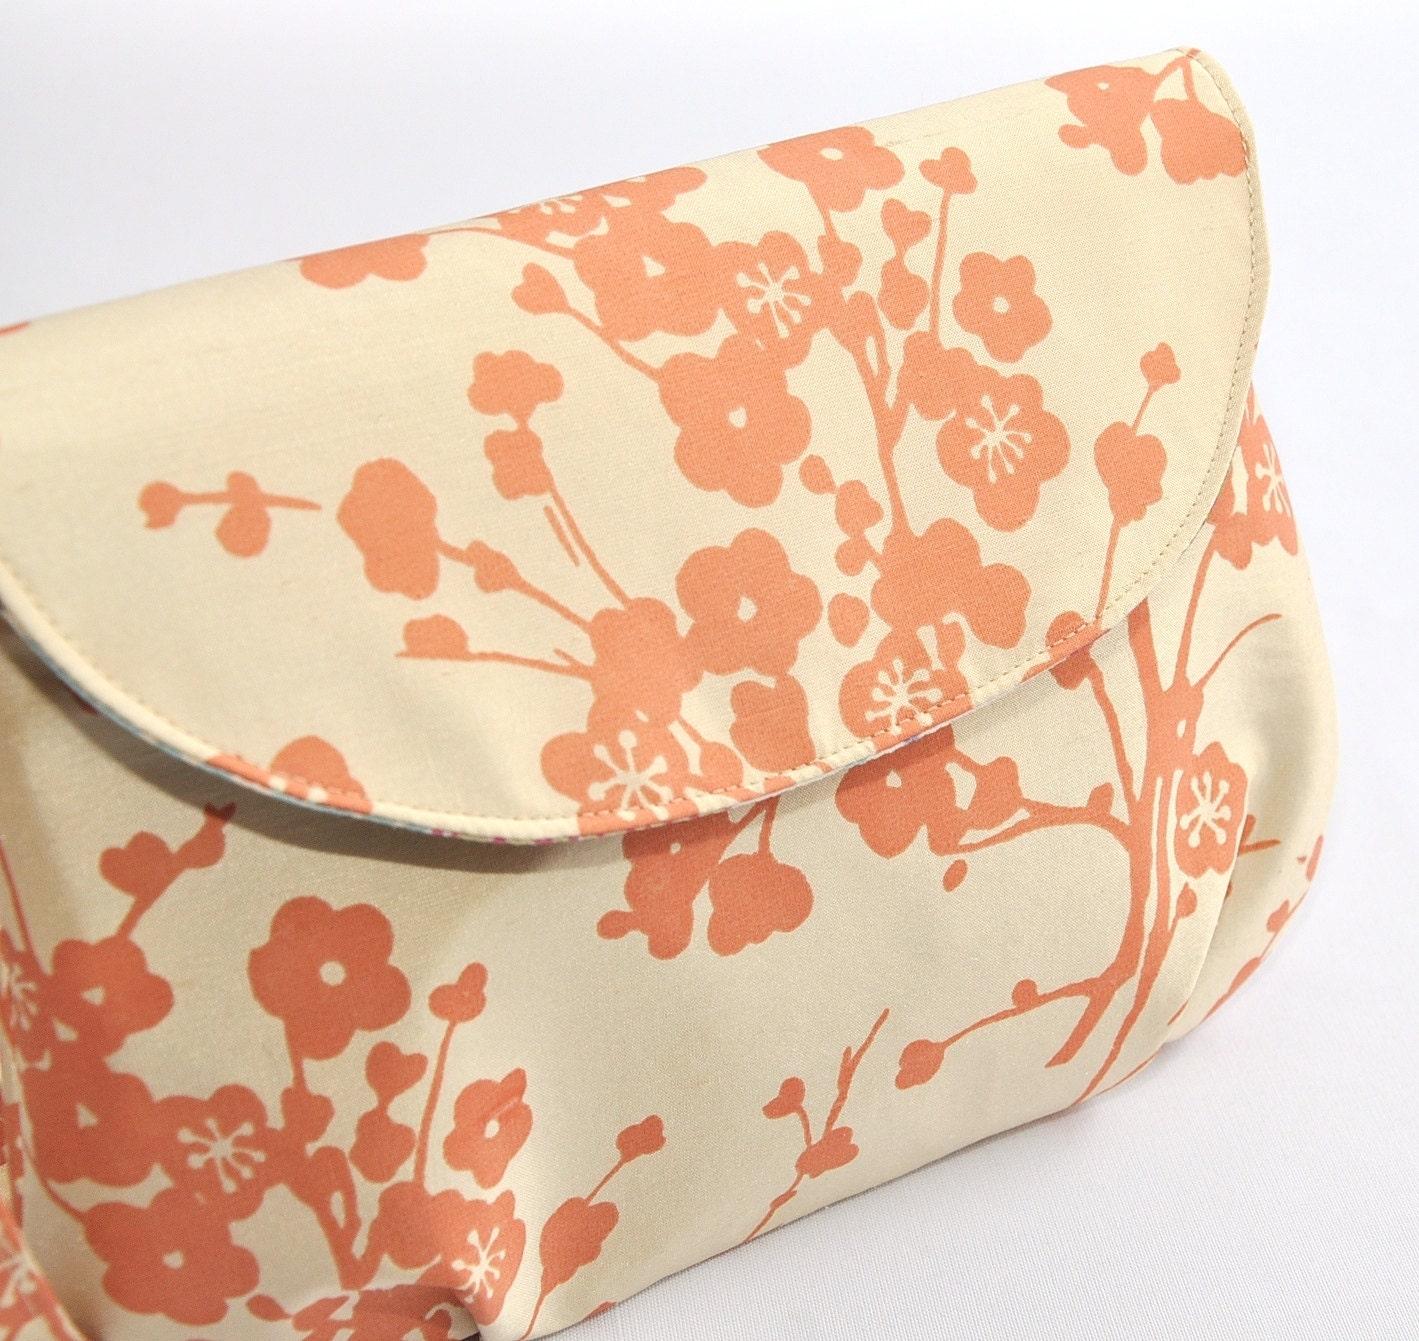 WOMEN'S CLUTCH /// Silk Cherry Blossoms Addy Wristlet - PeteandPaul